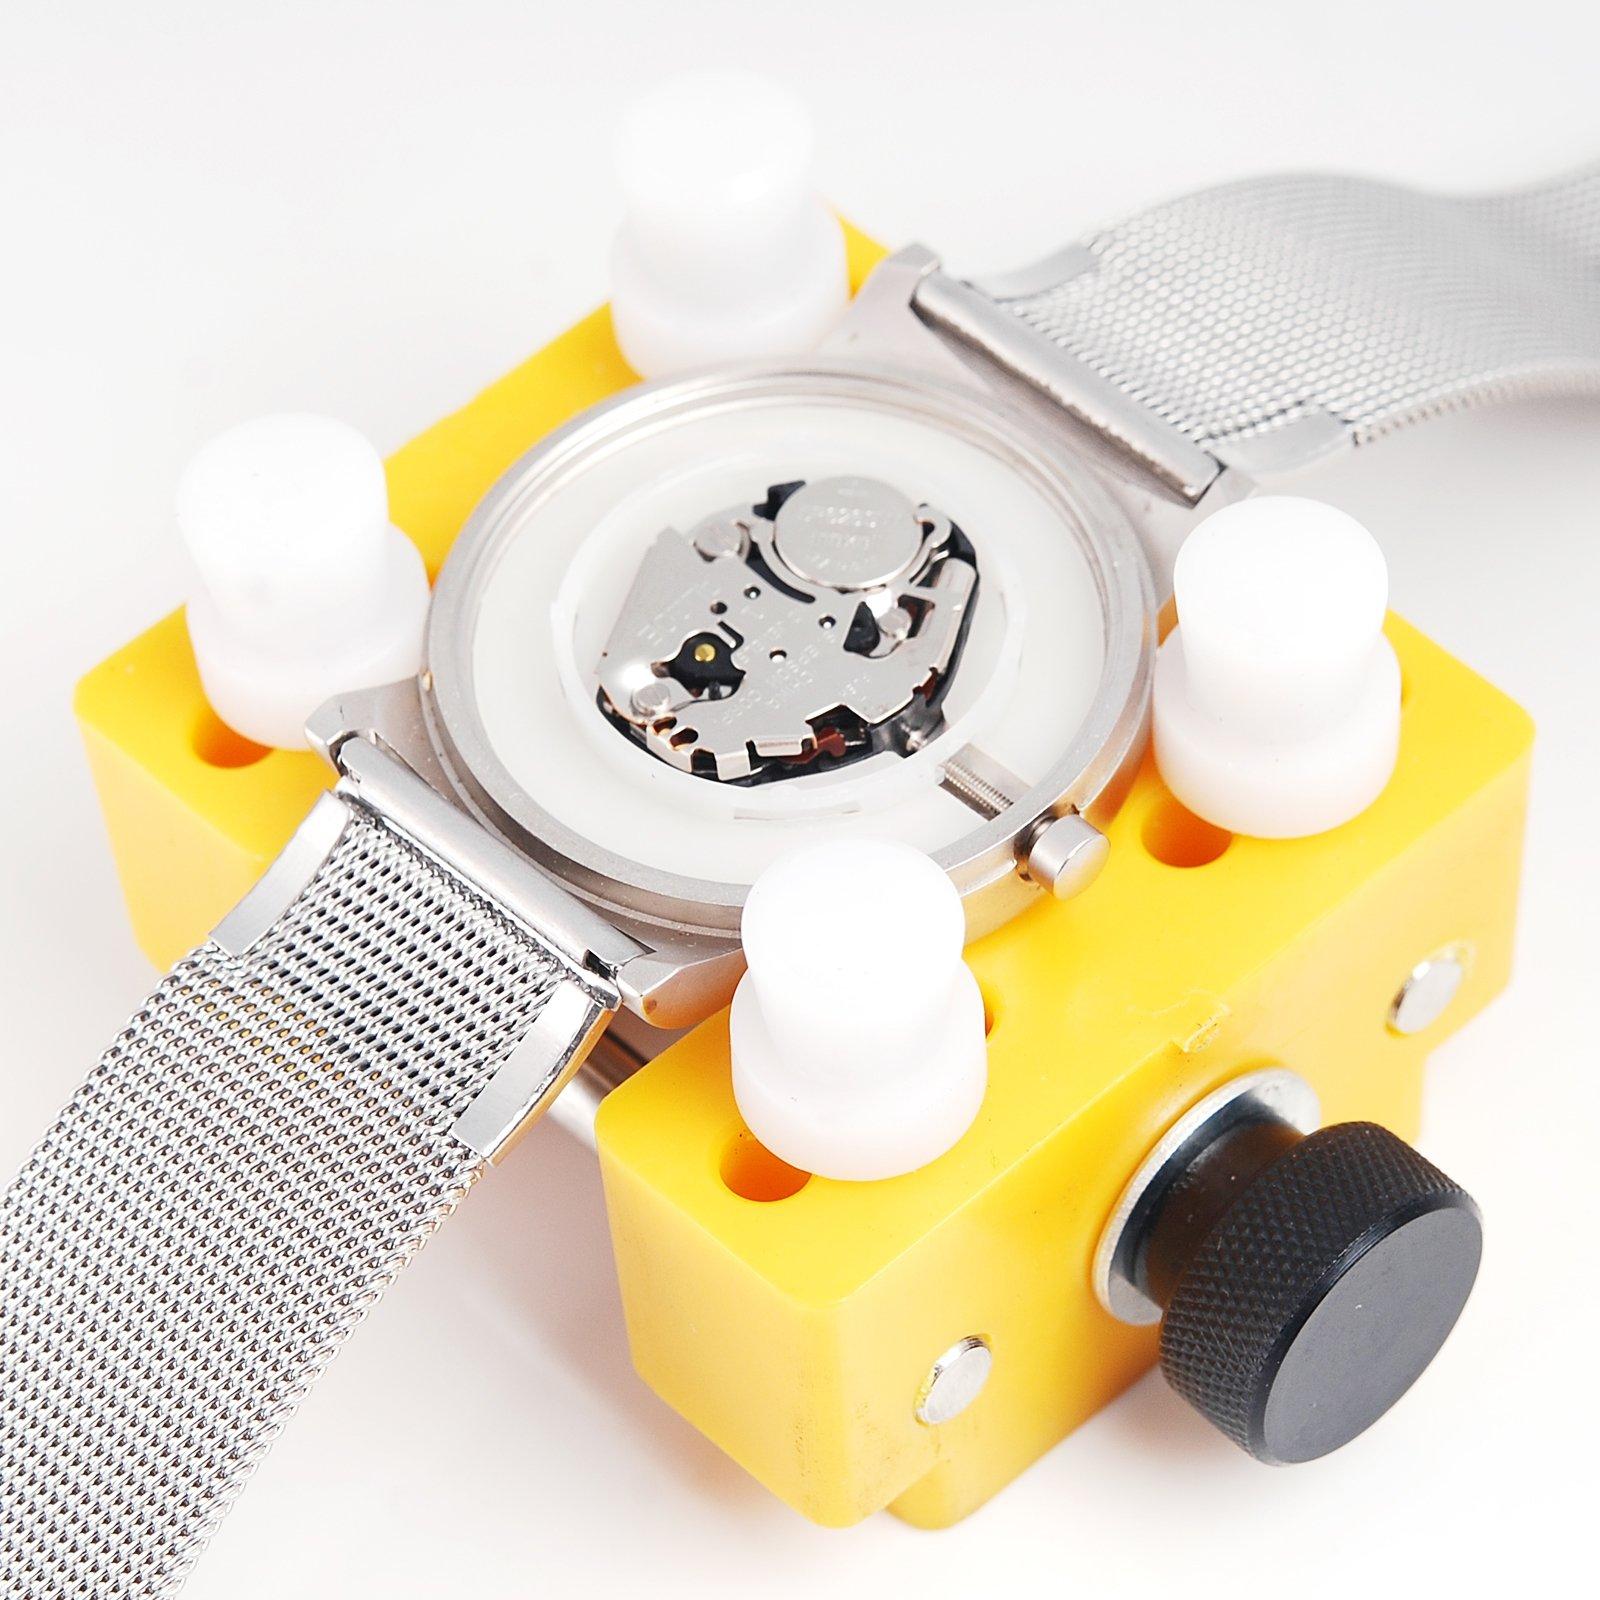 AMPM24 Watch Case Back Holder Repair Remover Opener Tool KIT WTL004